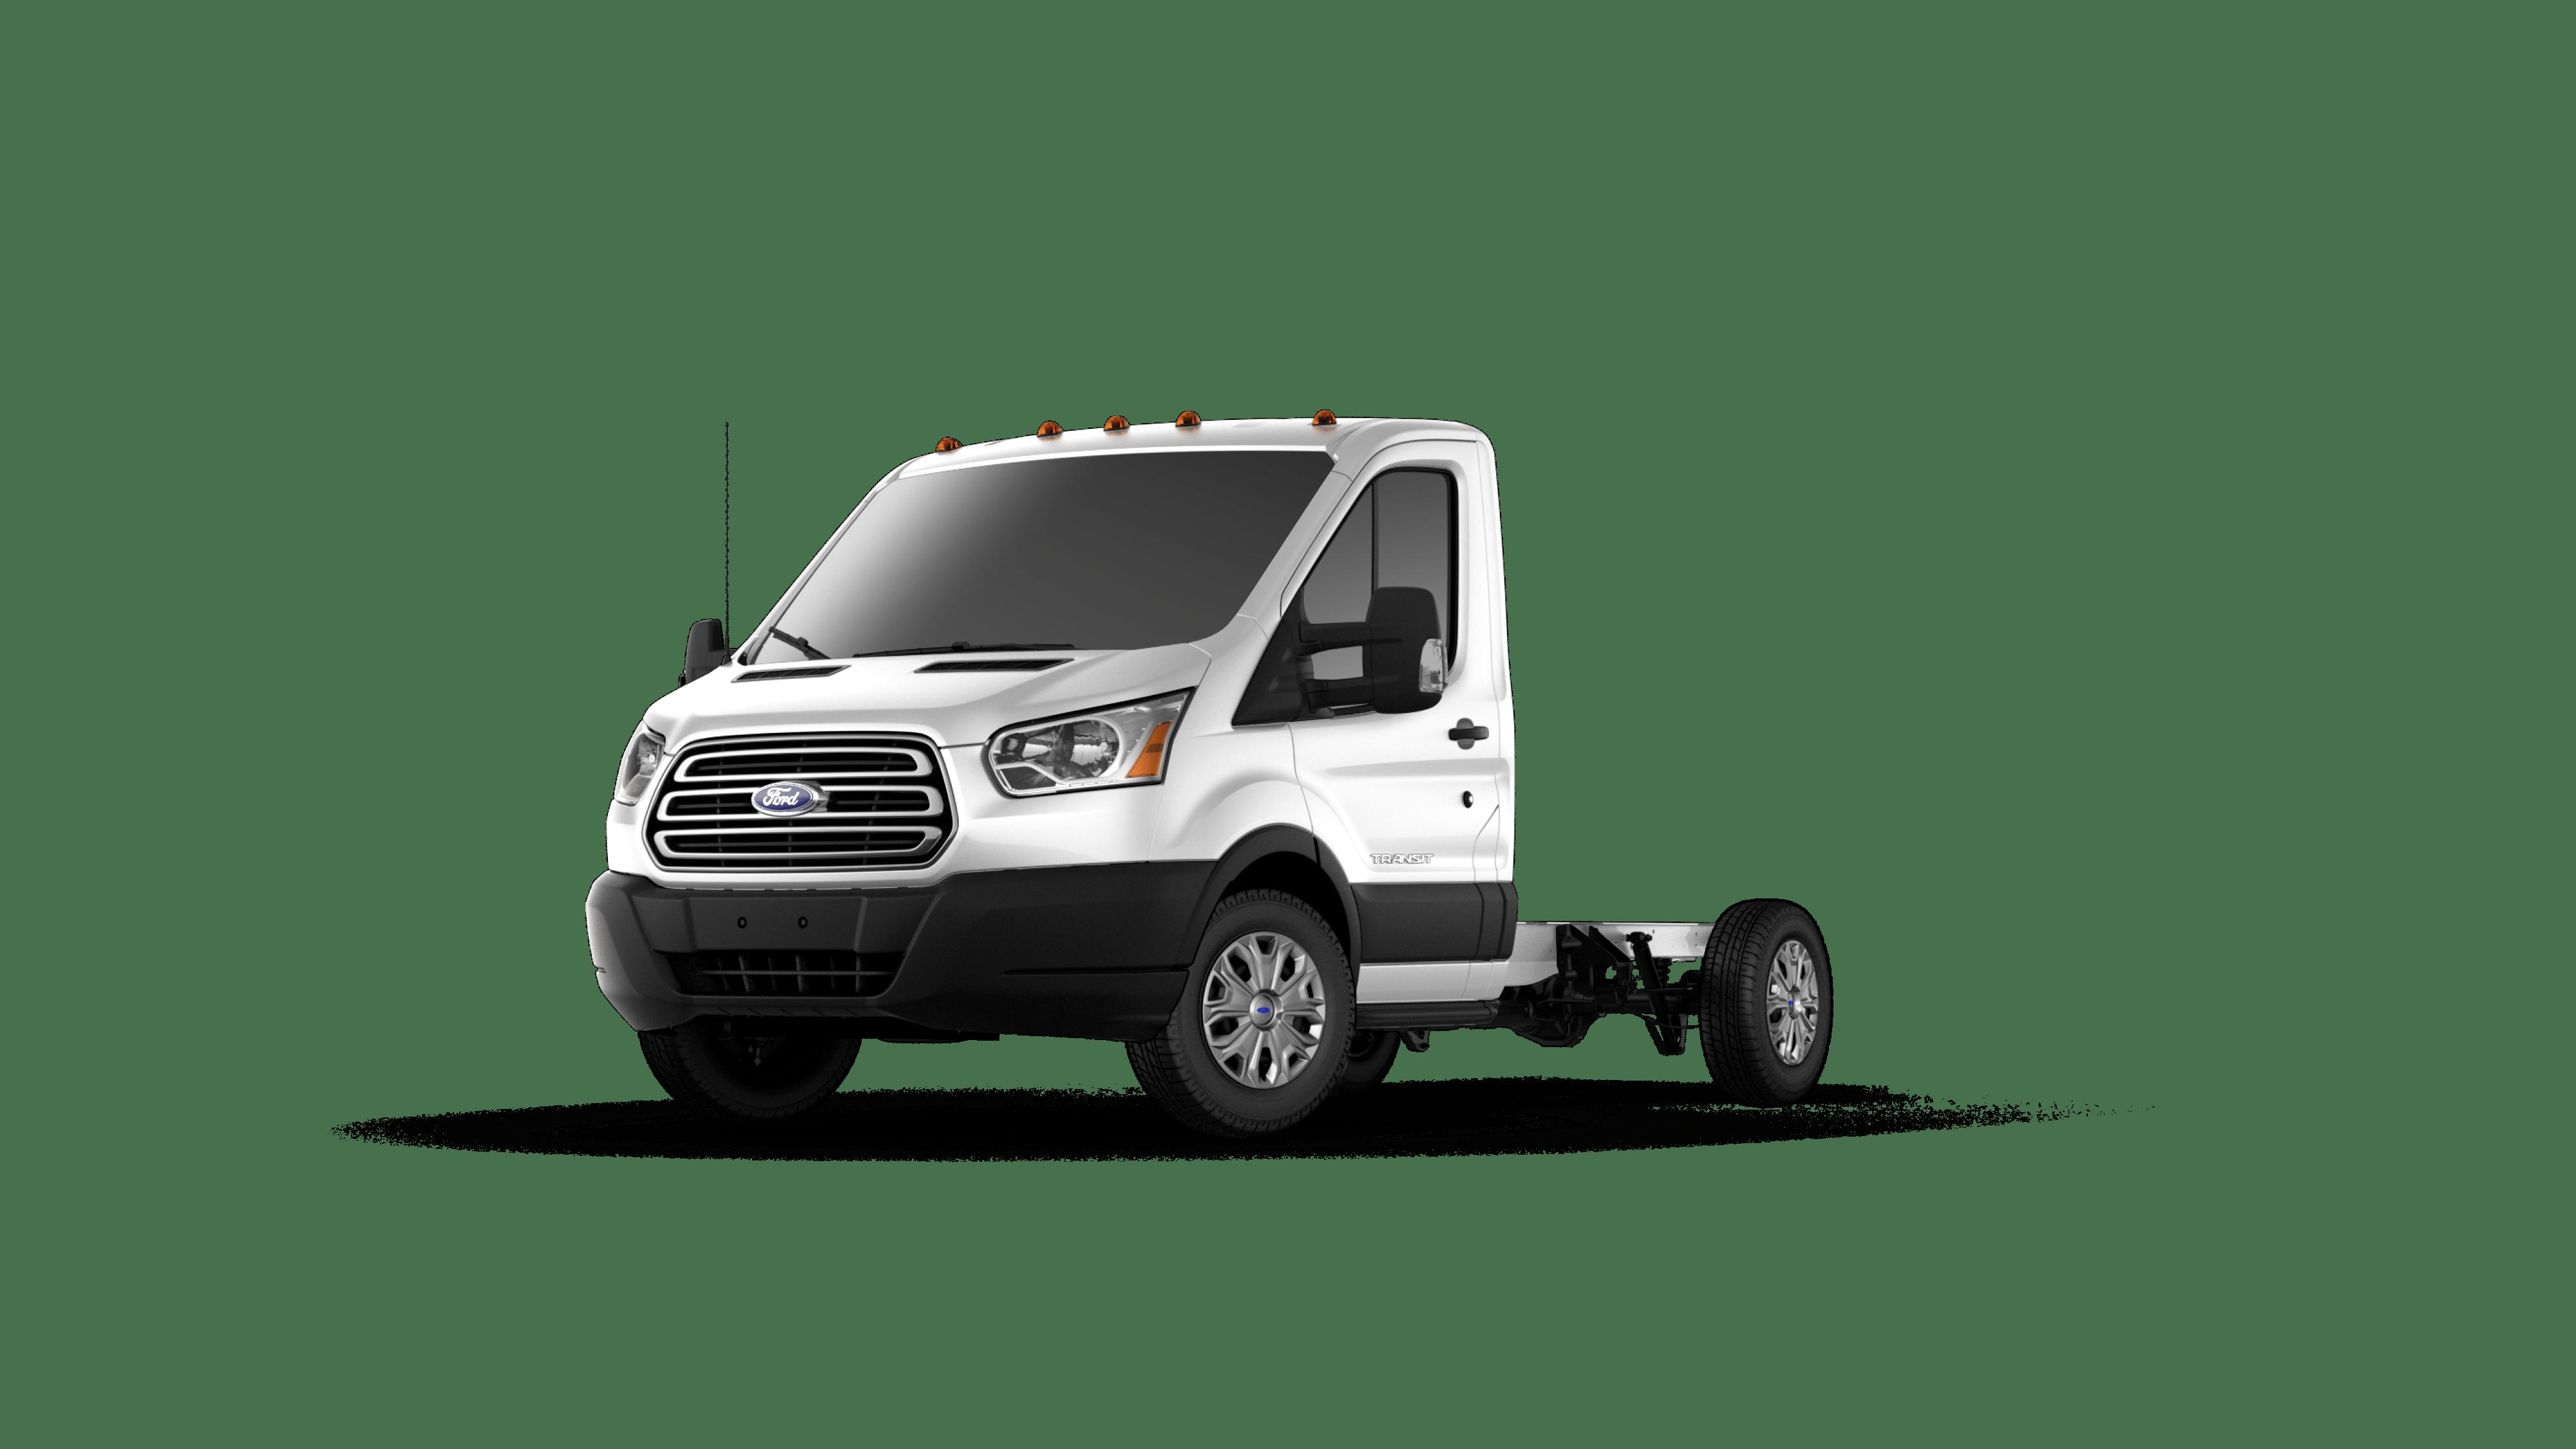 2018 Ford Transit Cutaway Vehicle Photo in Souderton, PA 18964-1038